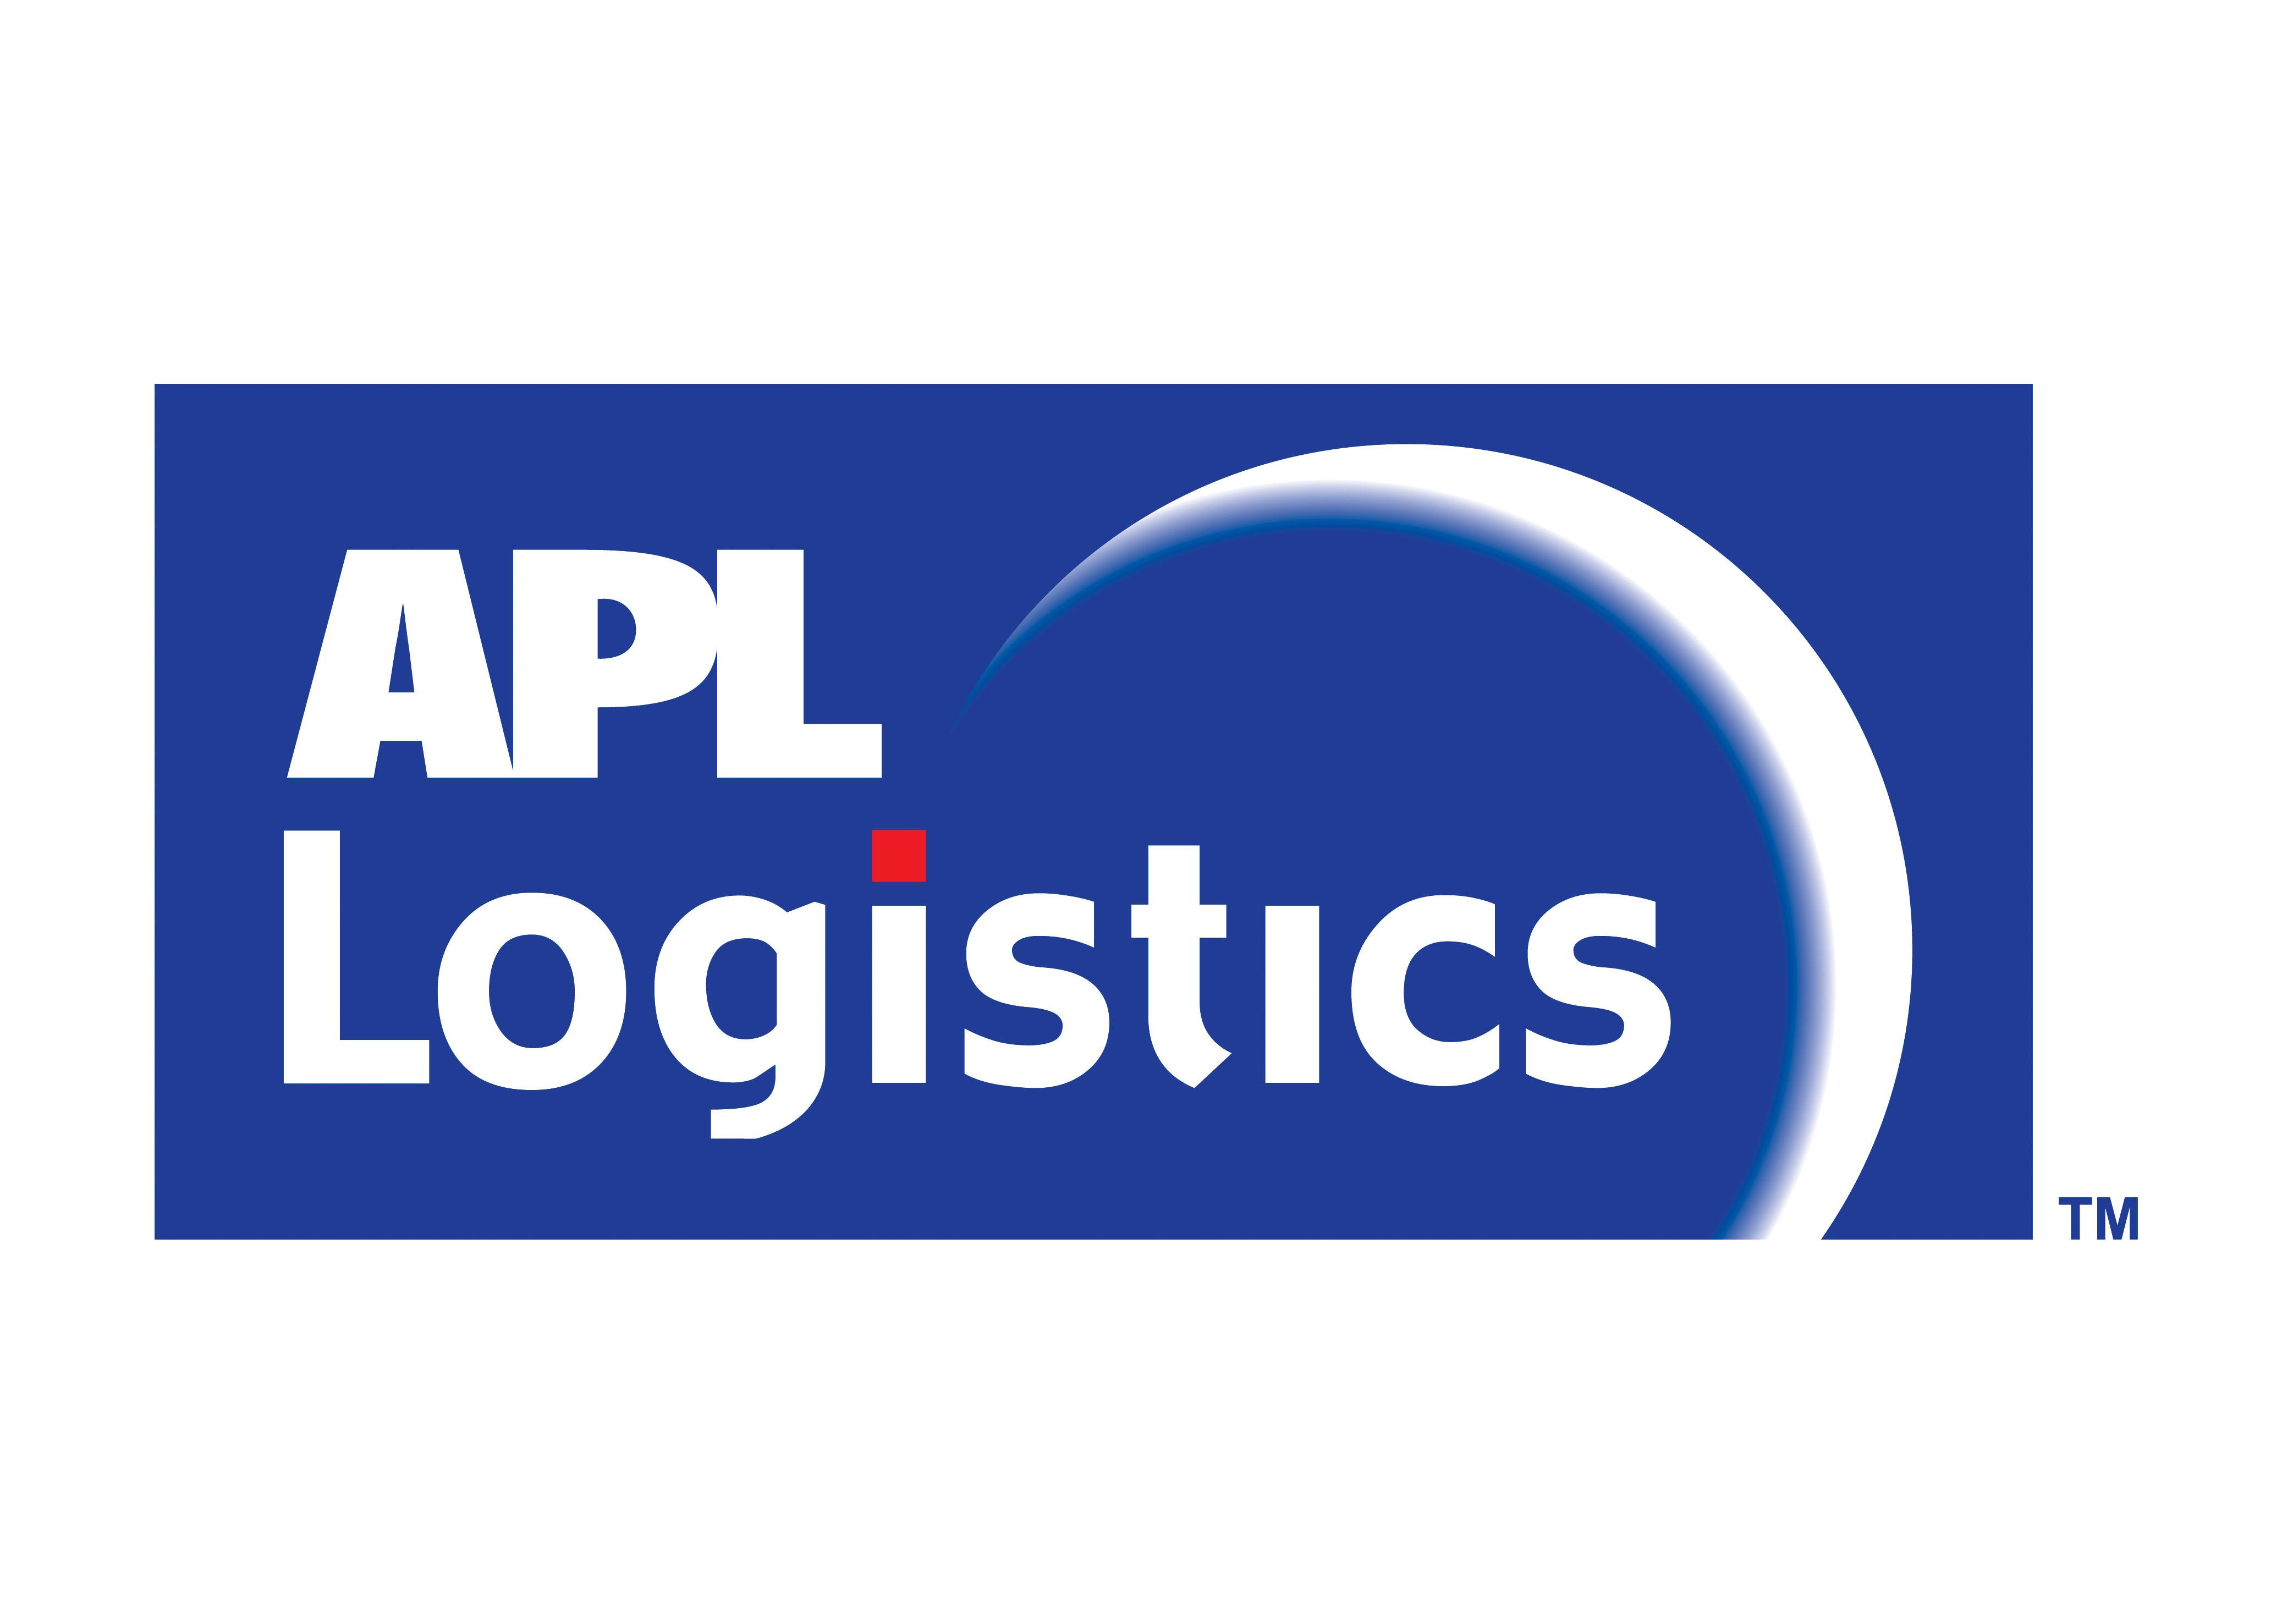 Find Jobs At Apl Logistics Vietnam Company Limited